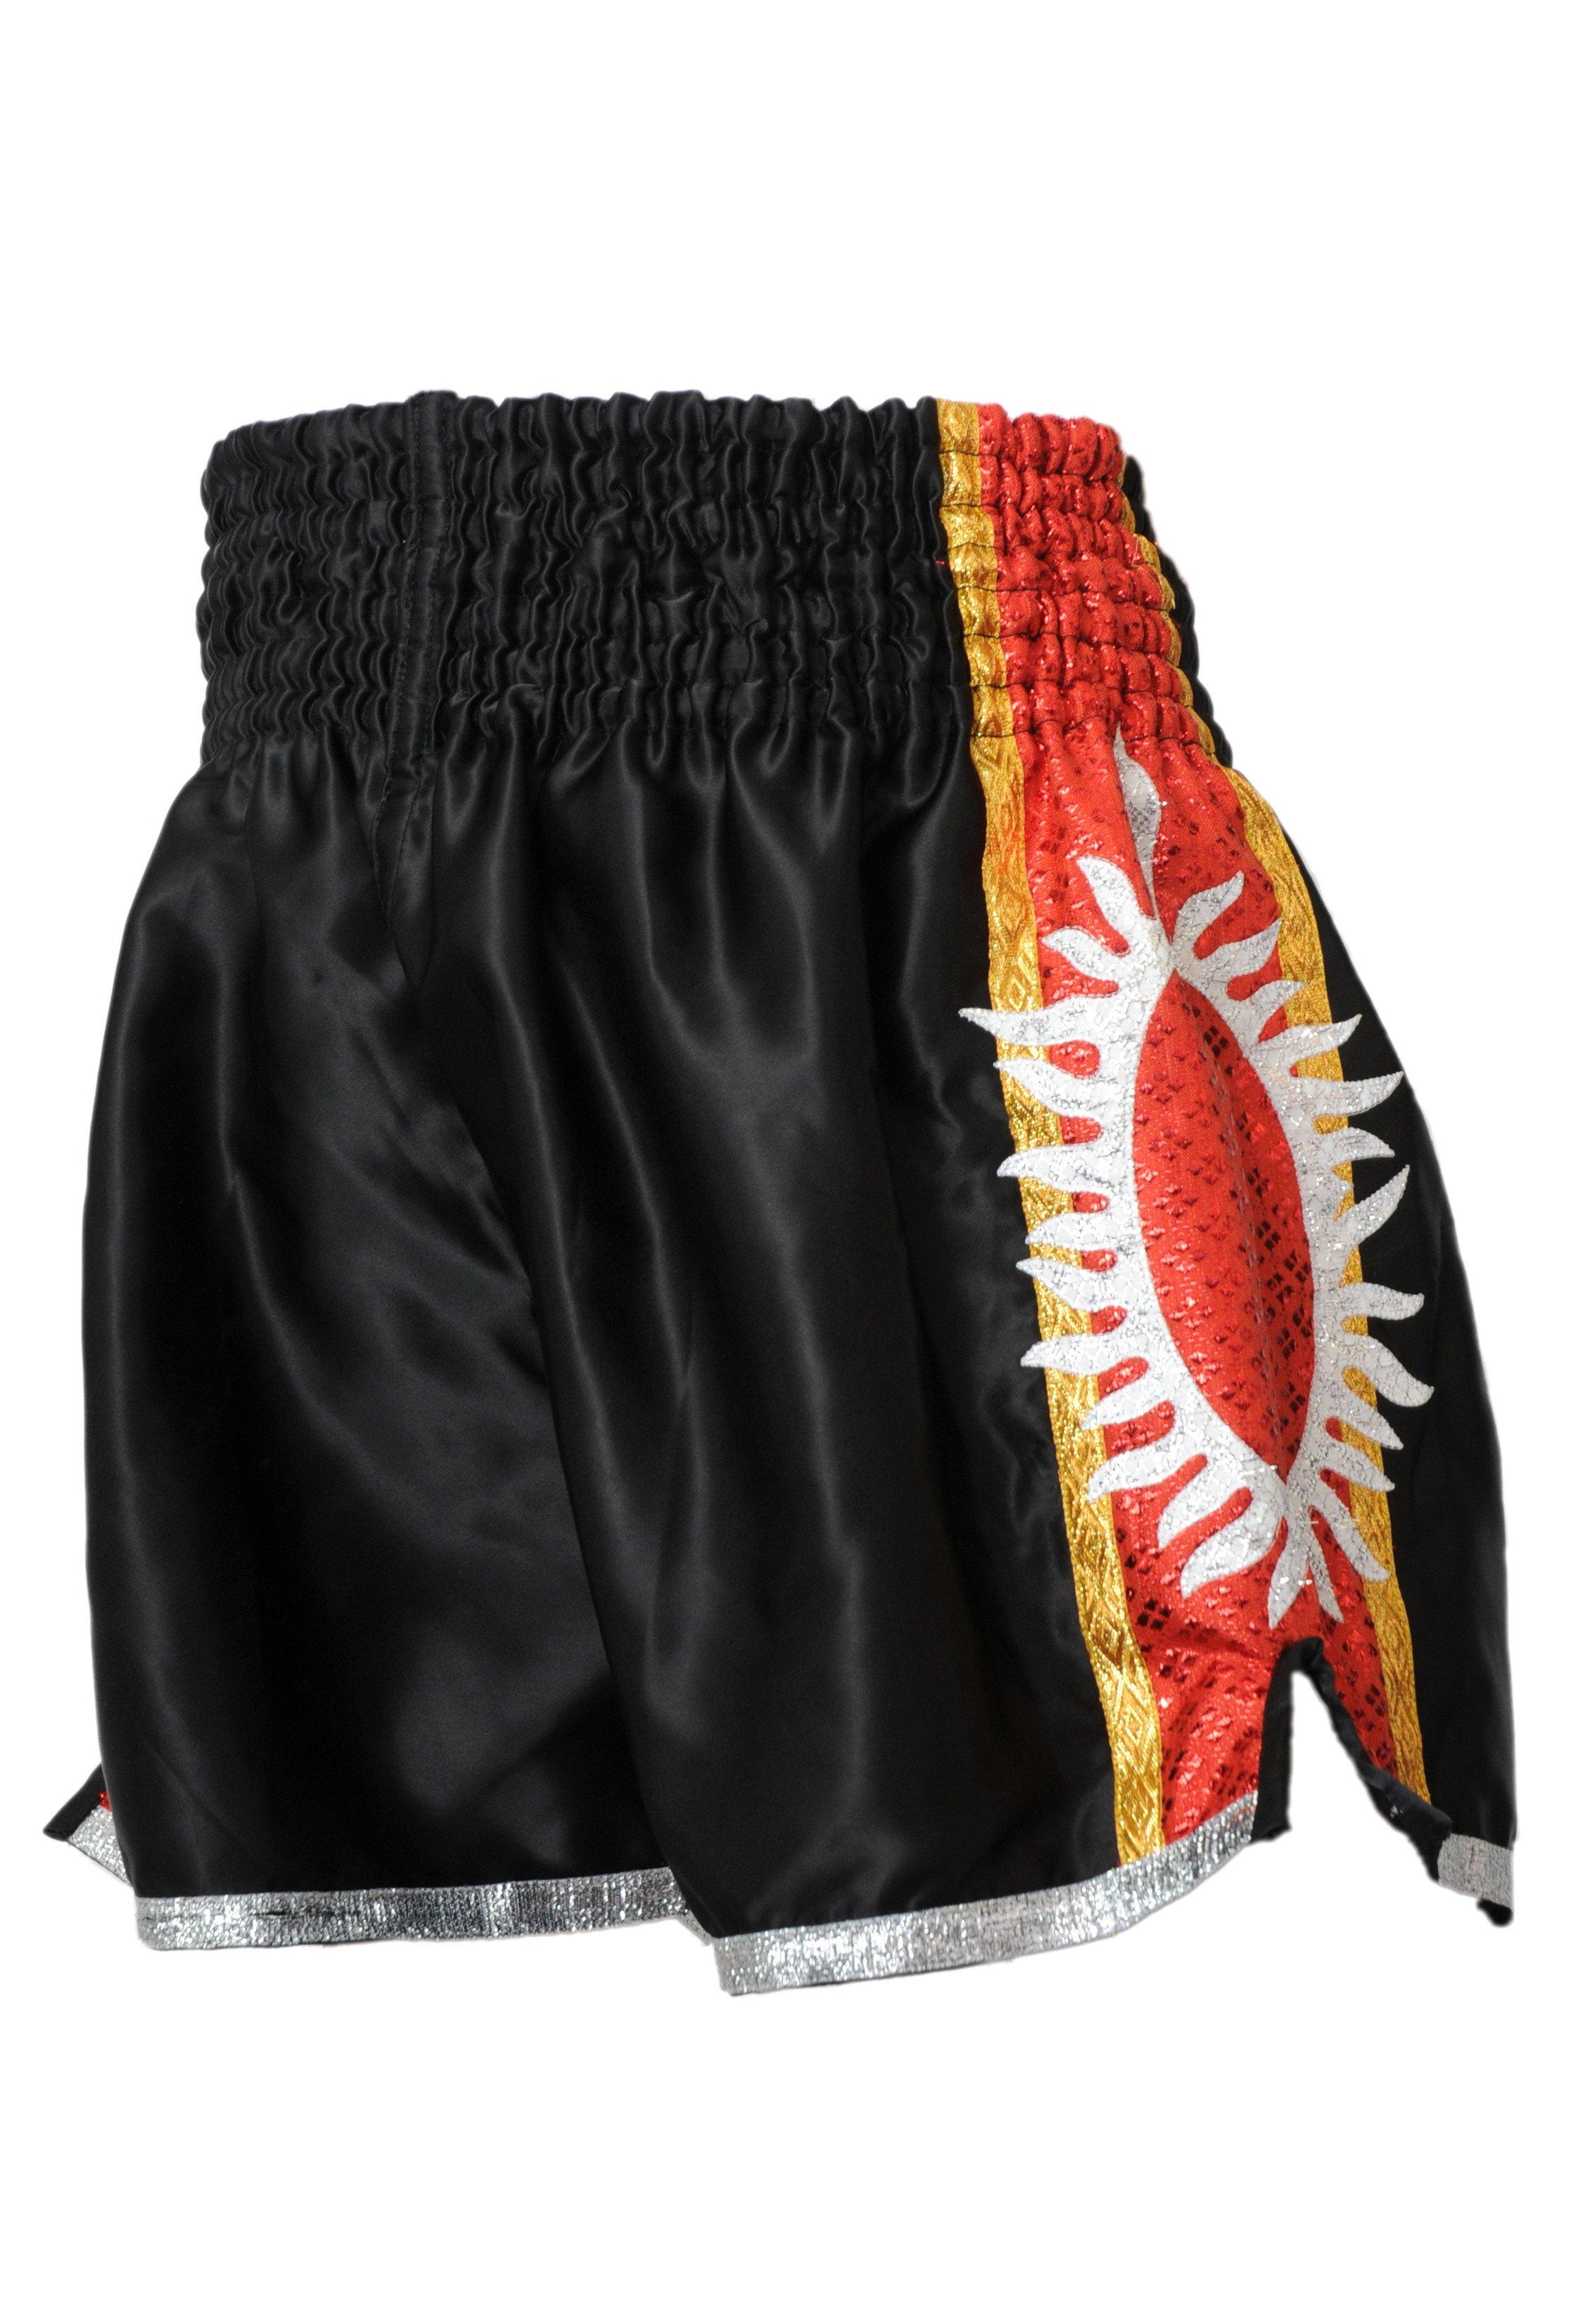 Short Boxe Thai ¨SUPERNOVA¨ noir/rouge